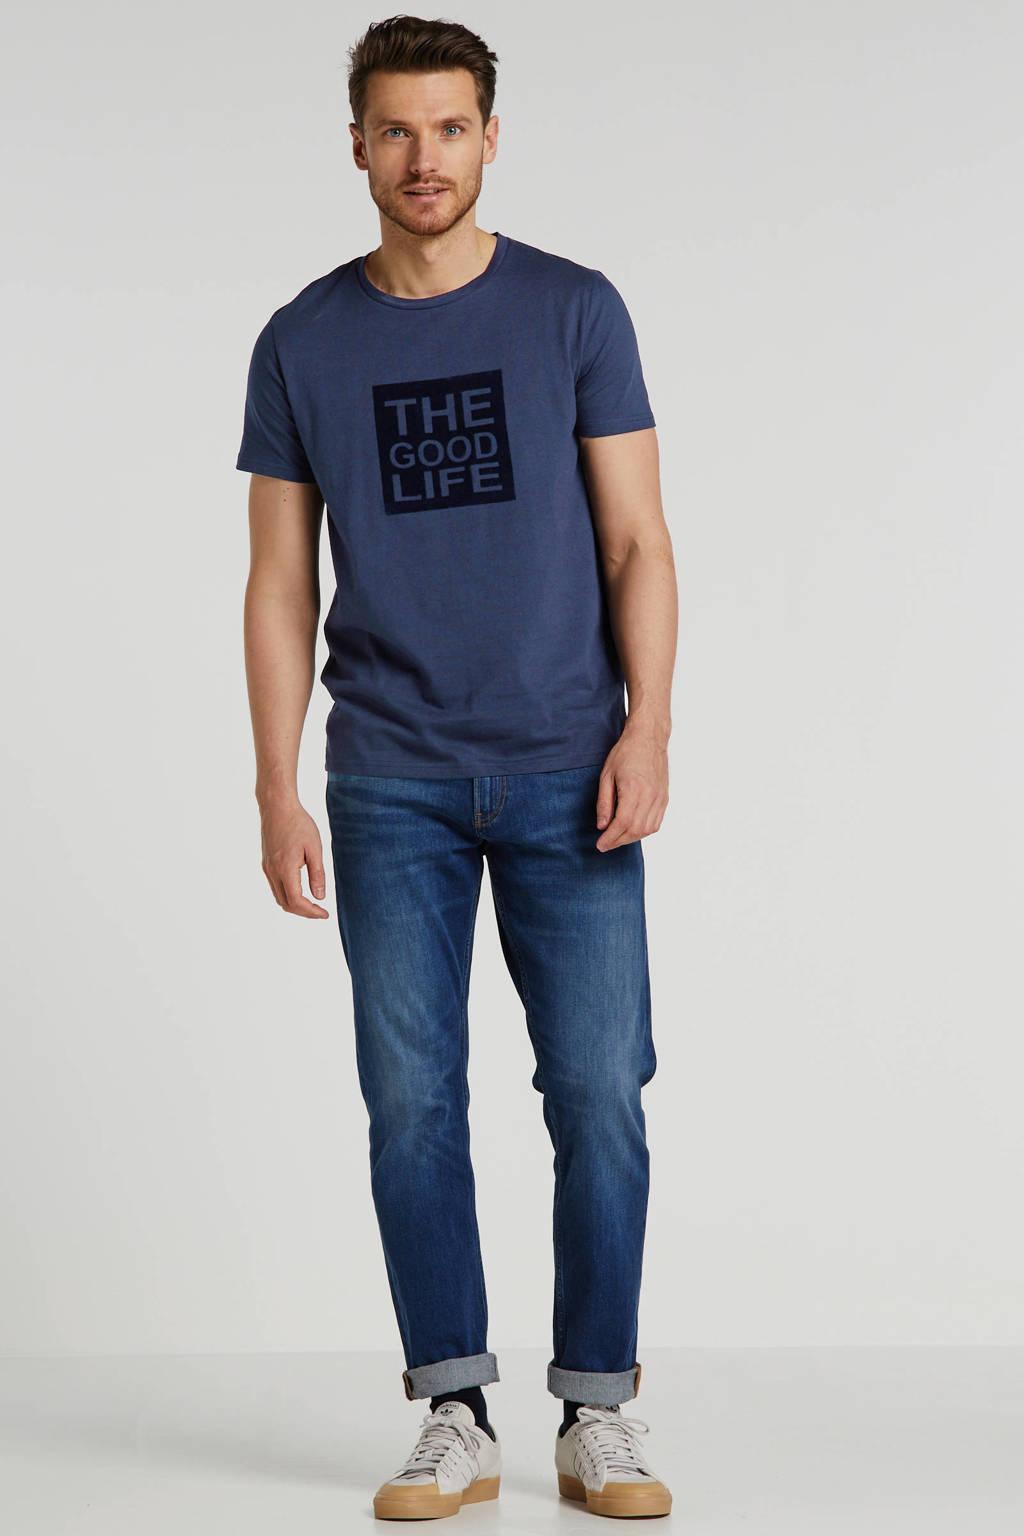 J.C. Rags T-shirt met printopdruk donkerblauw, Donkerblauw